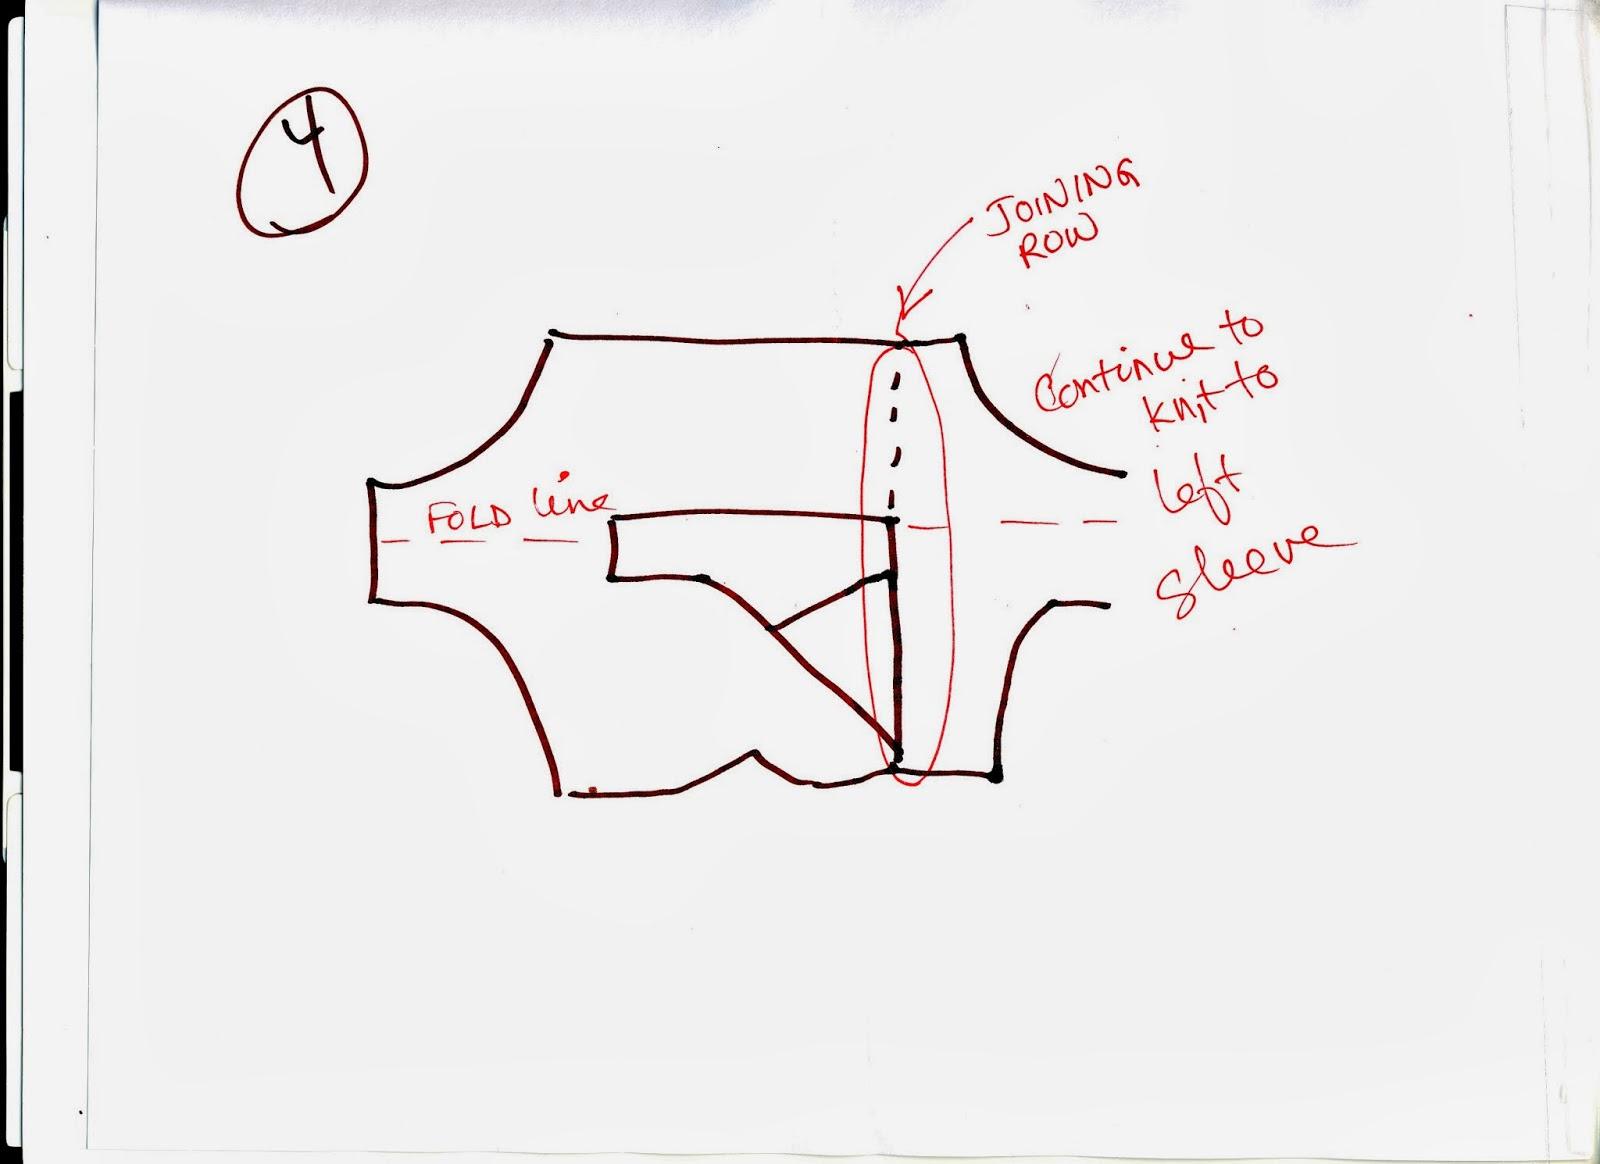 Ktm 250 Sxf Wiring Diagram